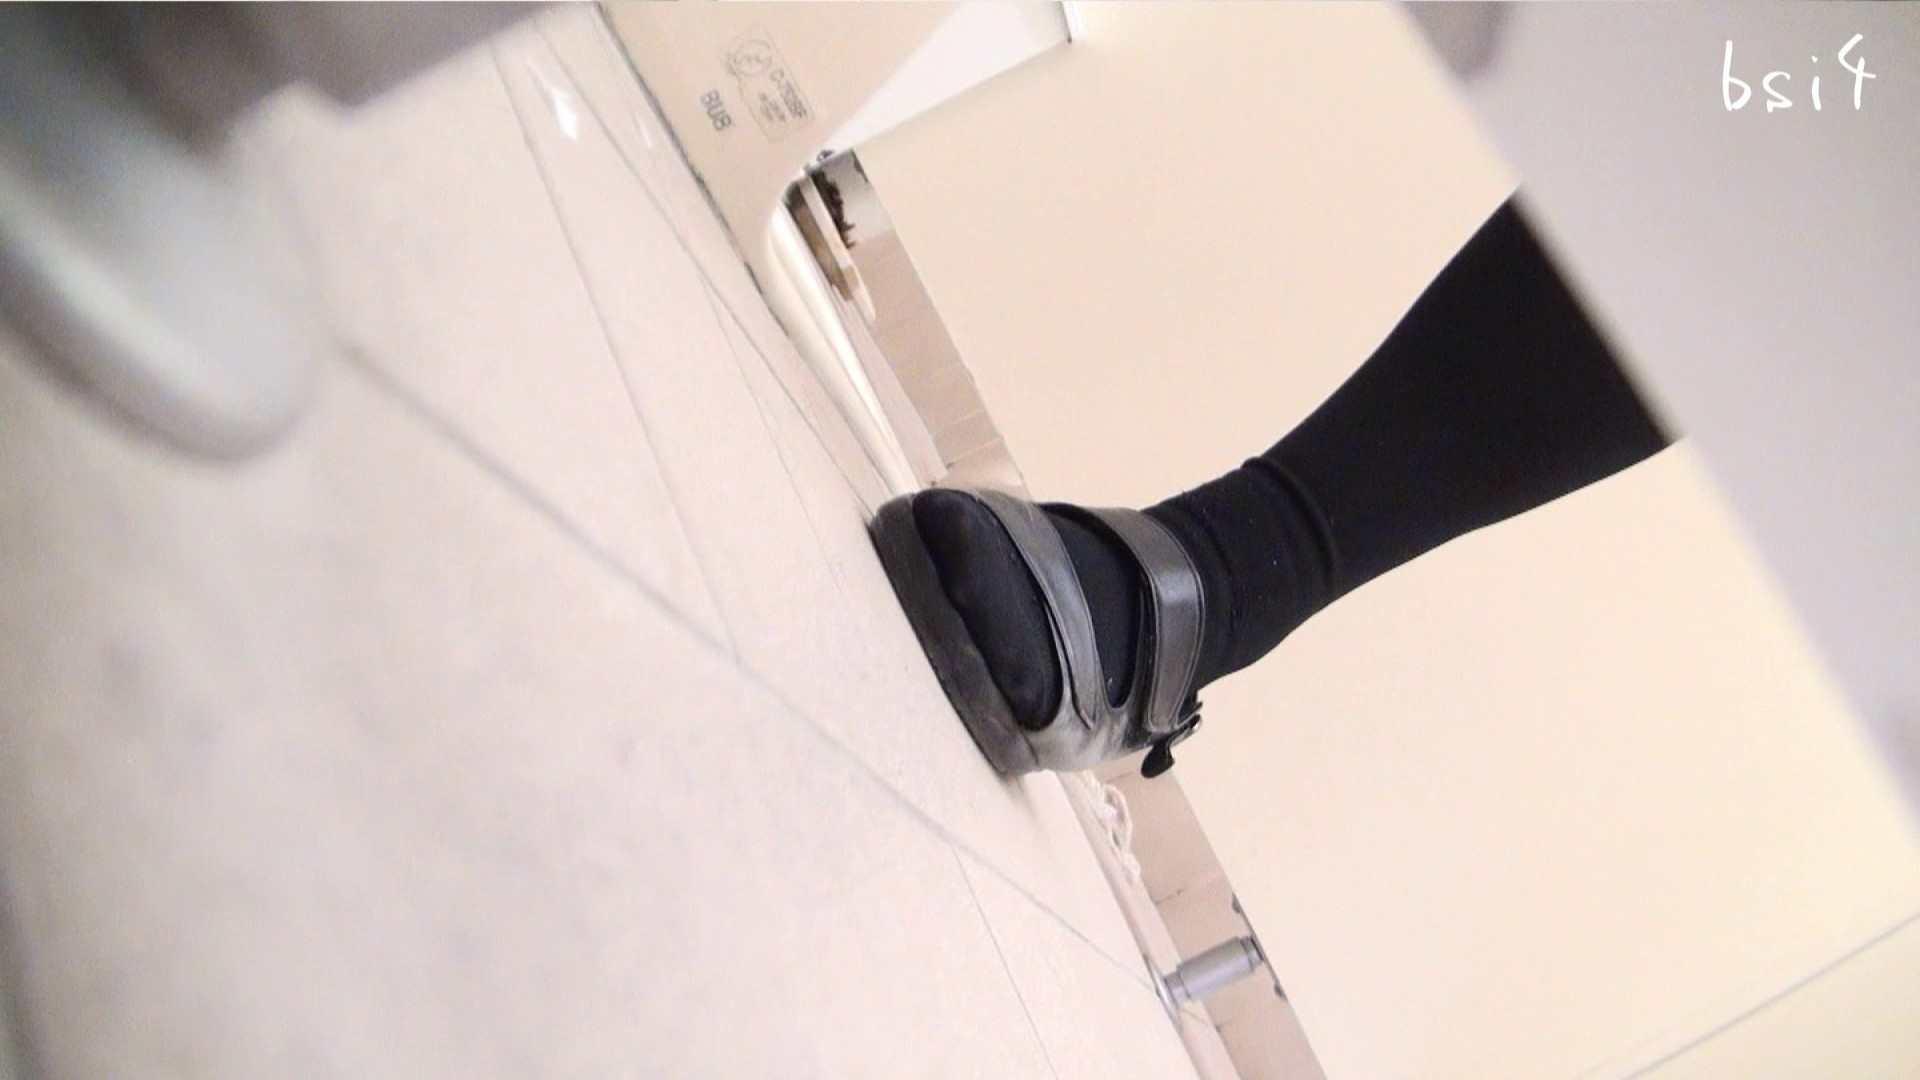 至高下半身盗撮-PREMIUM-【院内病棟編 】 vol.04 ナース ワレメ動画紹介 71PIX 47